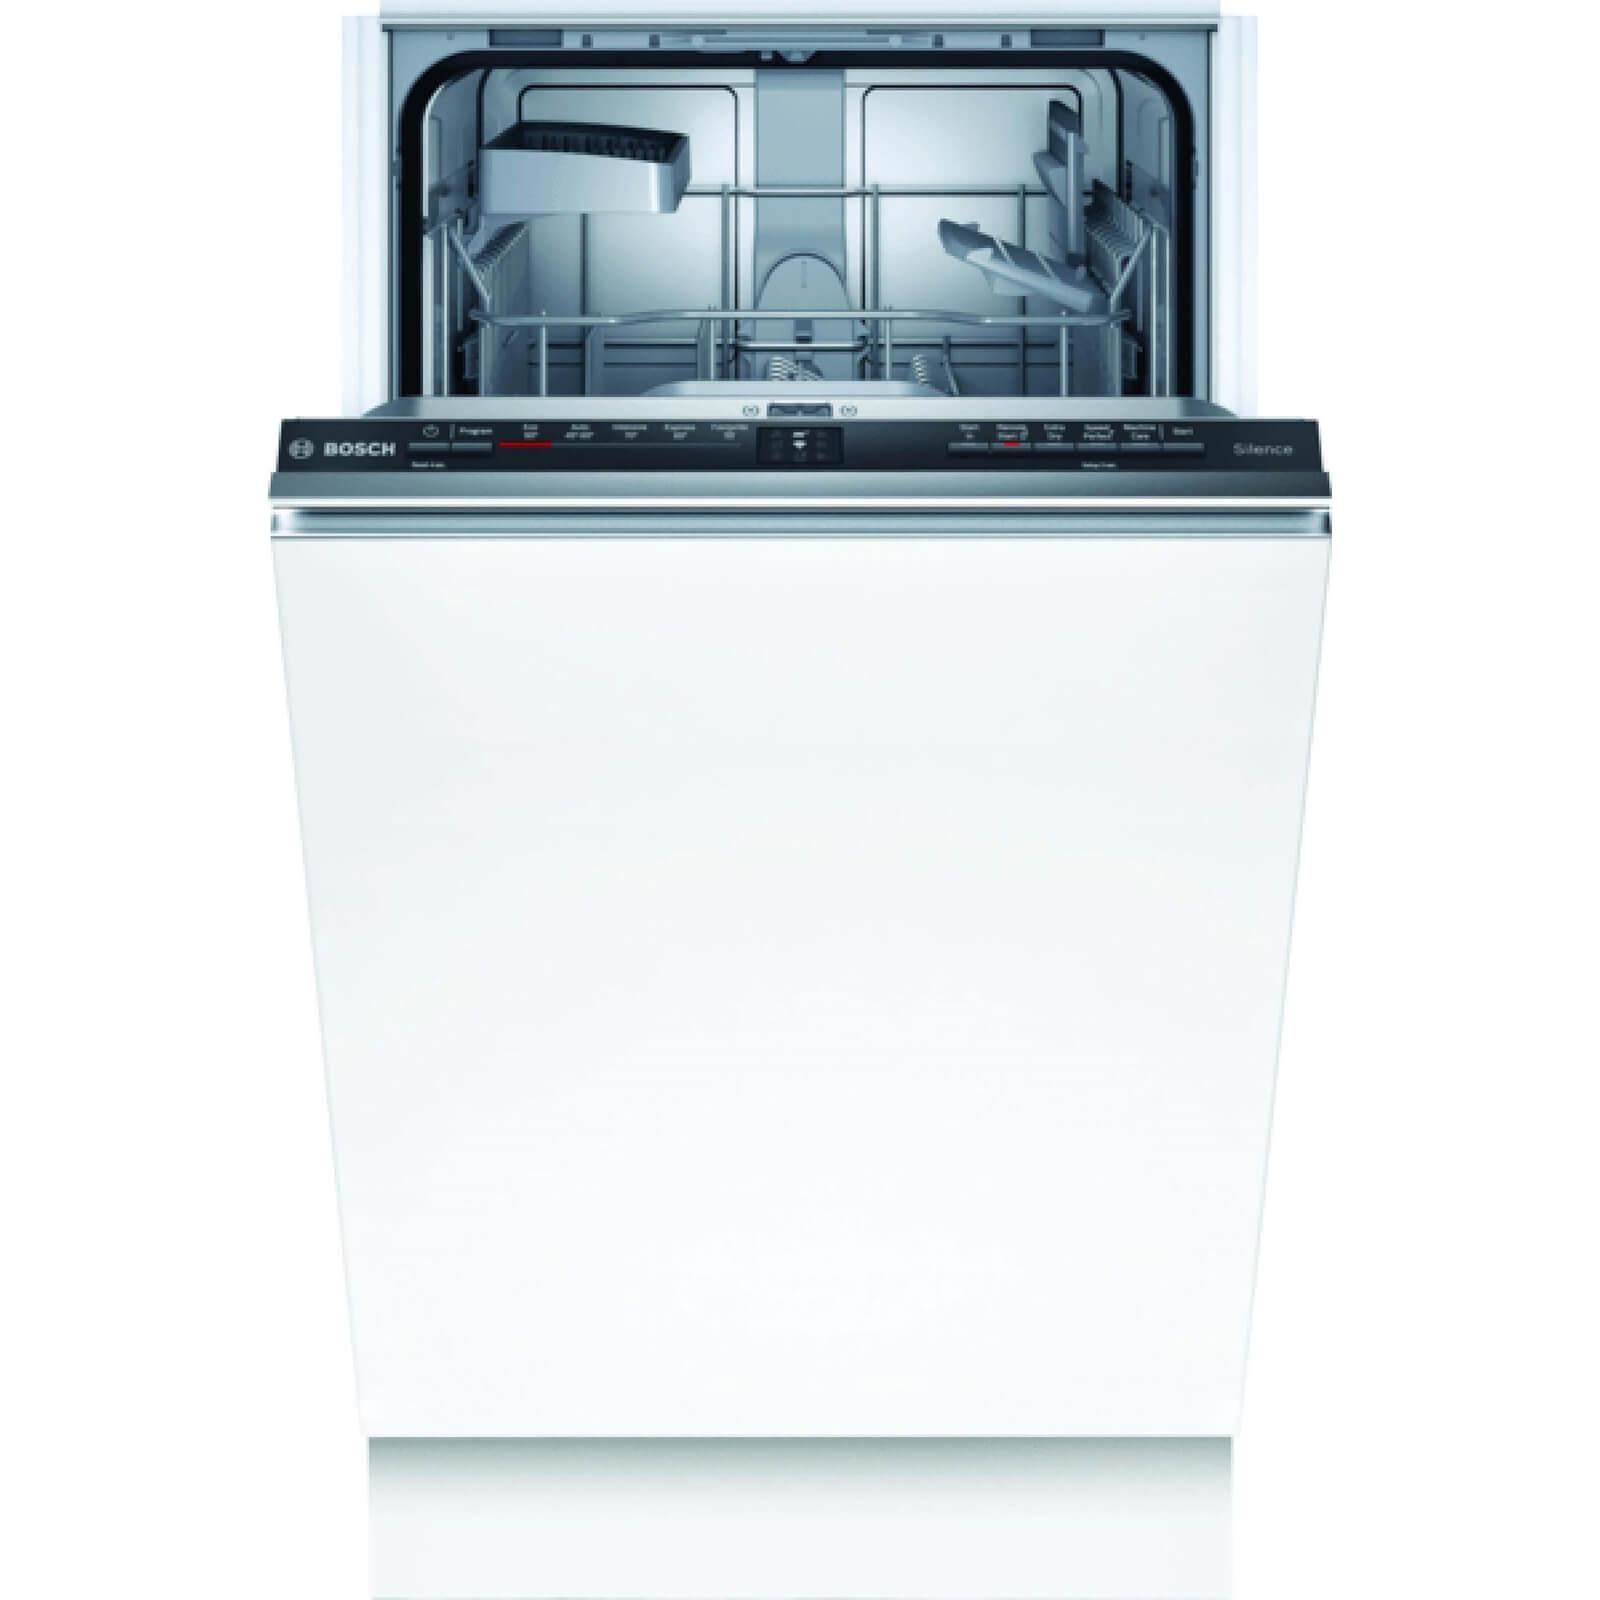 Bosch SPV2HKX39G Built-in 45cm Slimline Dishwasher